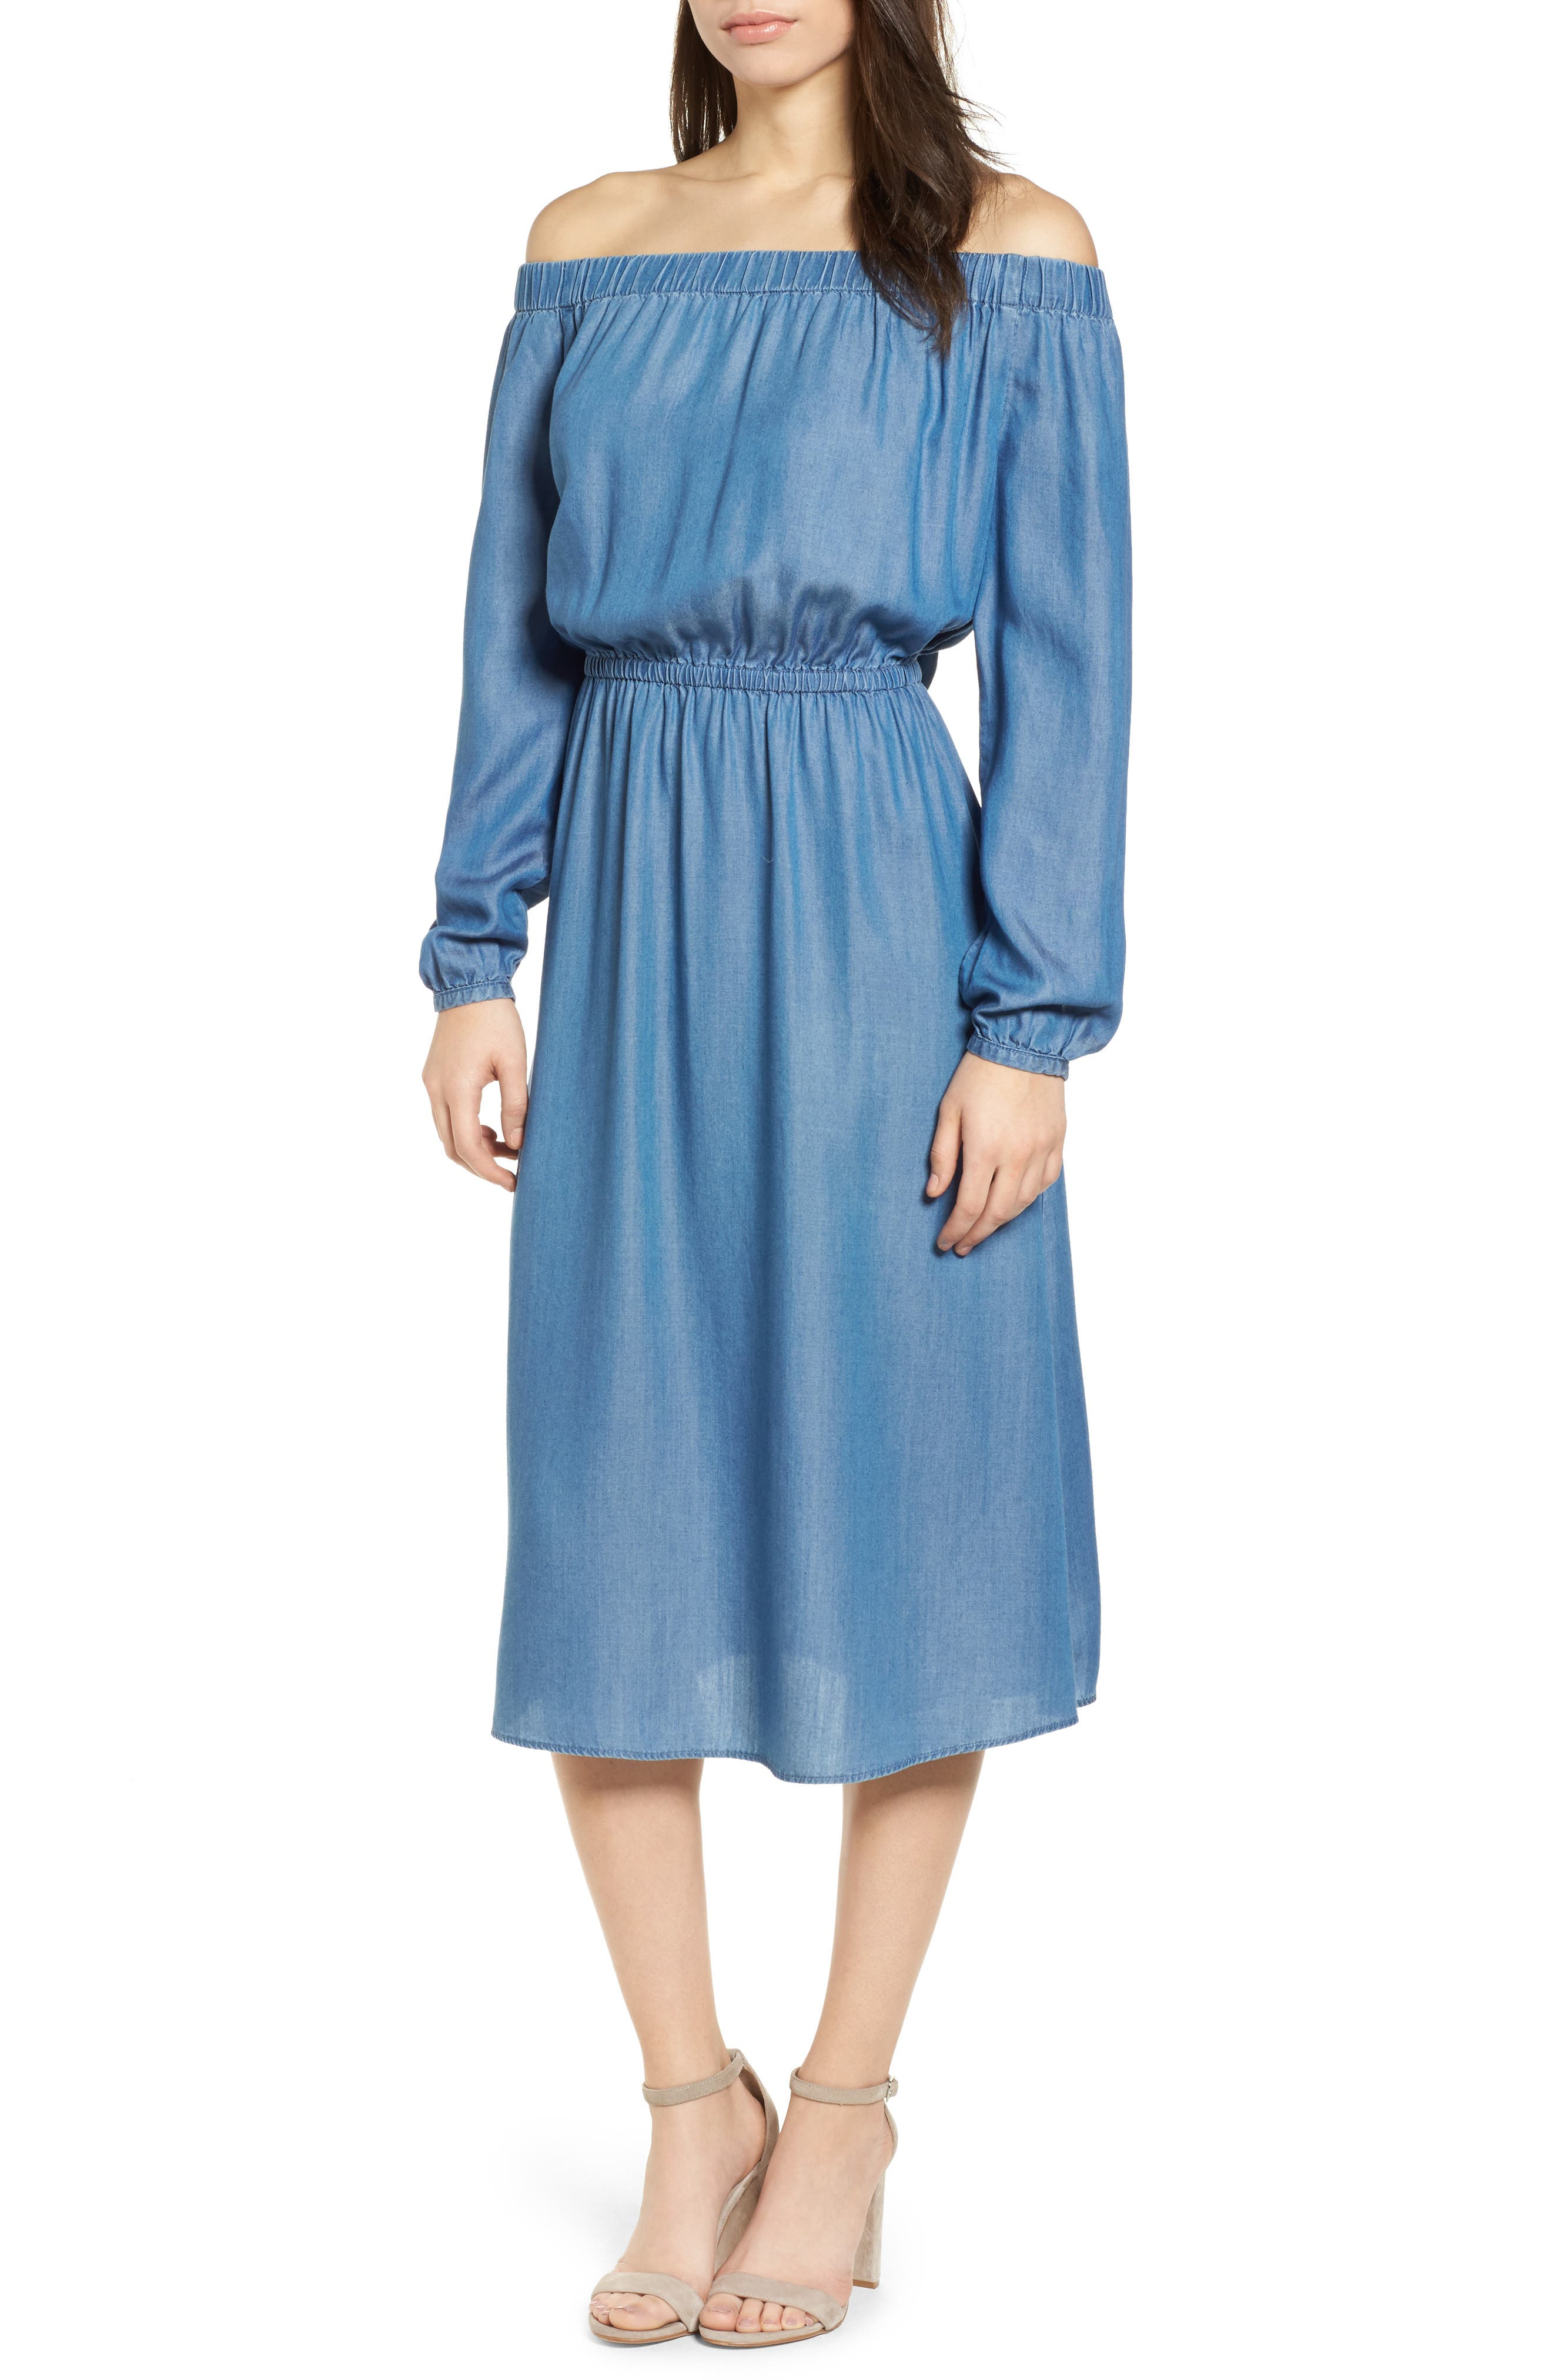 Off the Shoulder Midi Dress,                             Main thumbnail 1, color,                             401